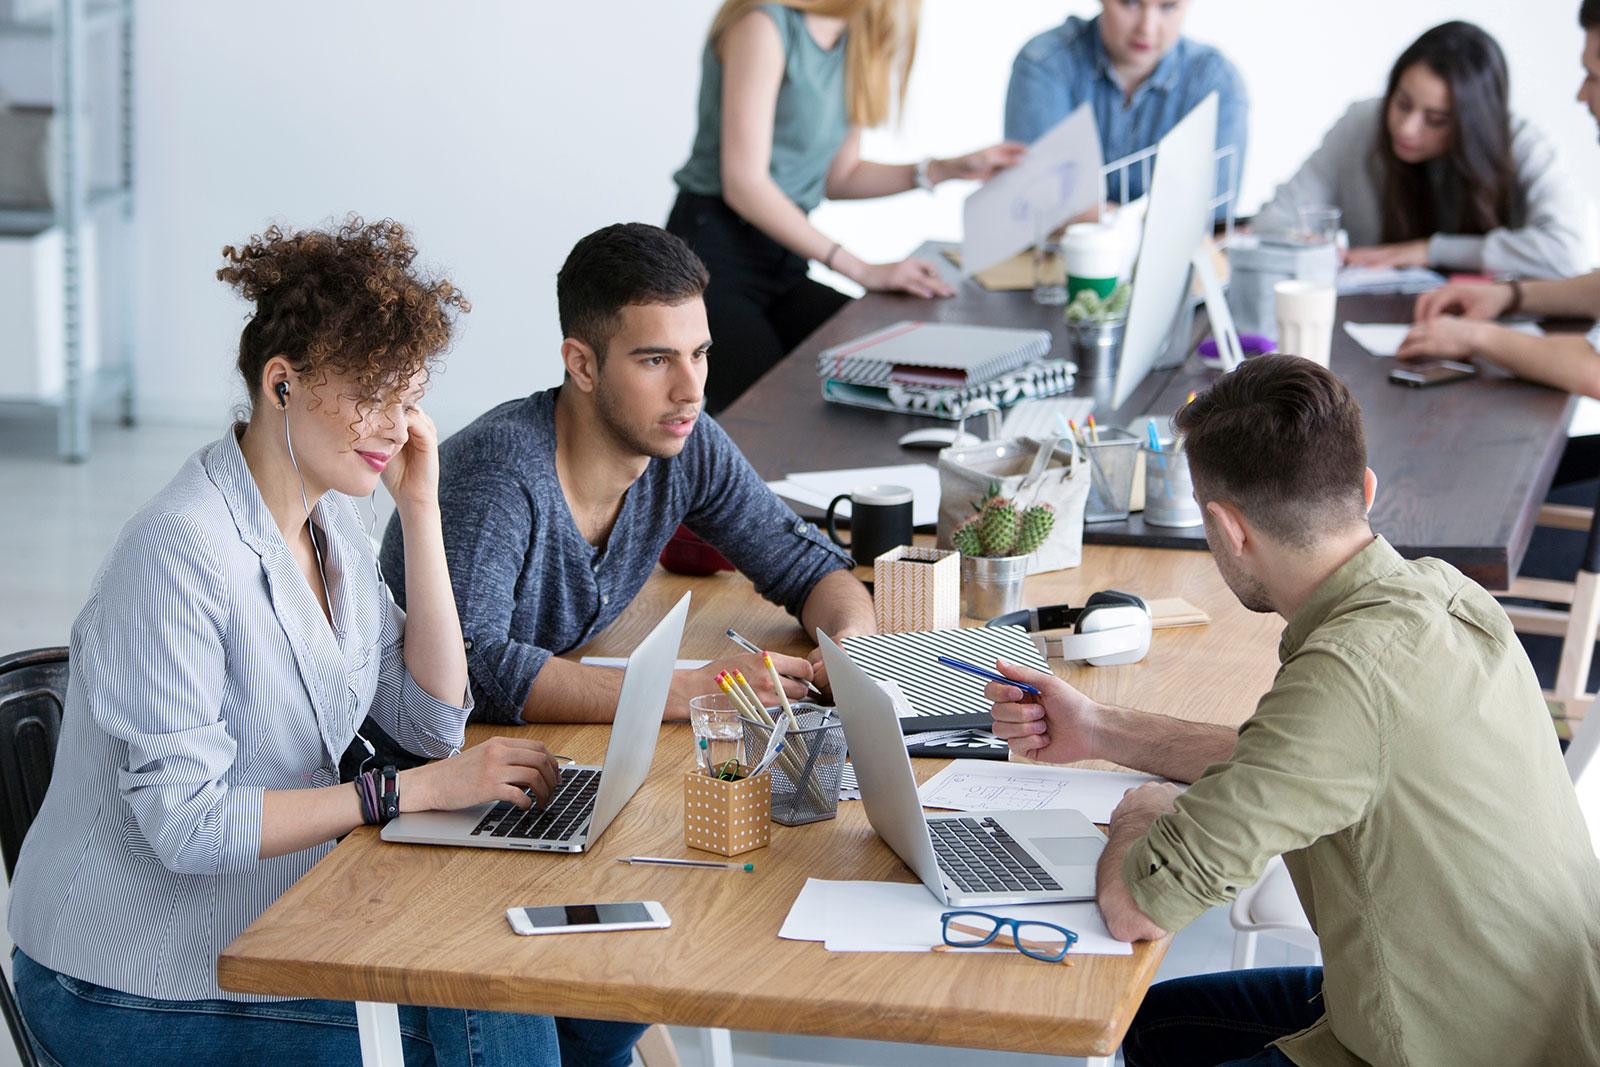 Digital Skills: What Top Agencies Look for When Hiring